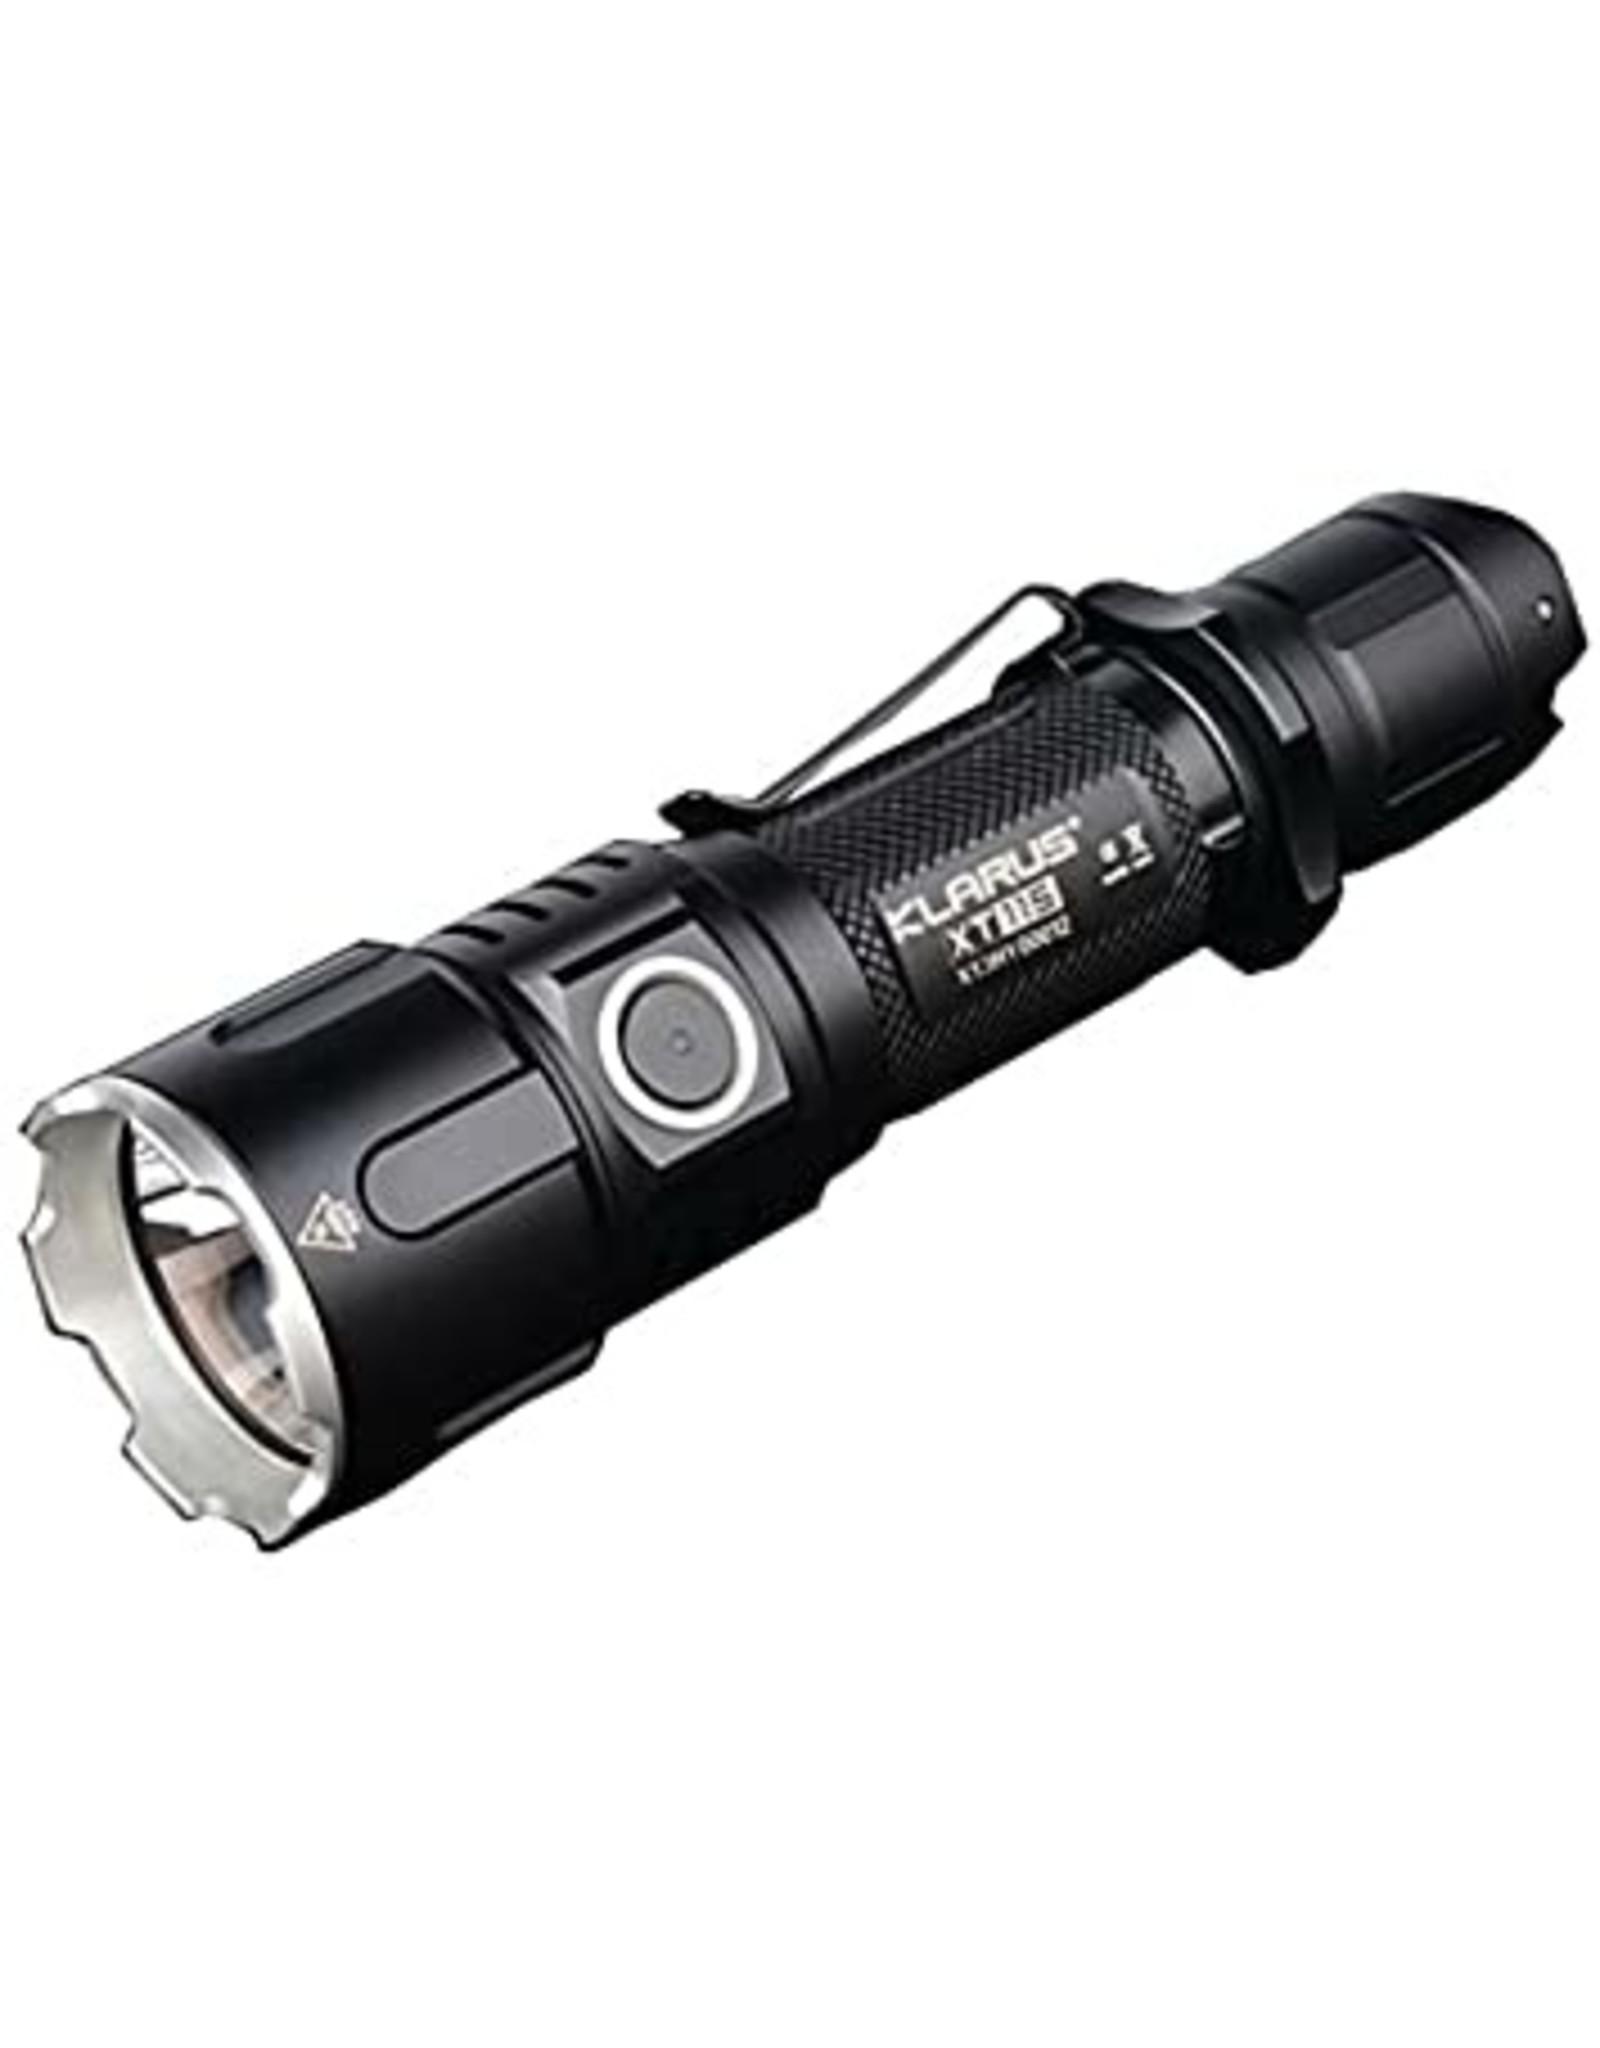 Klarus XT11S Flashlight 1100 Lumens